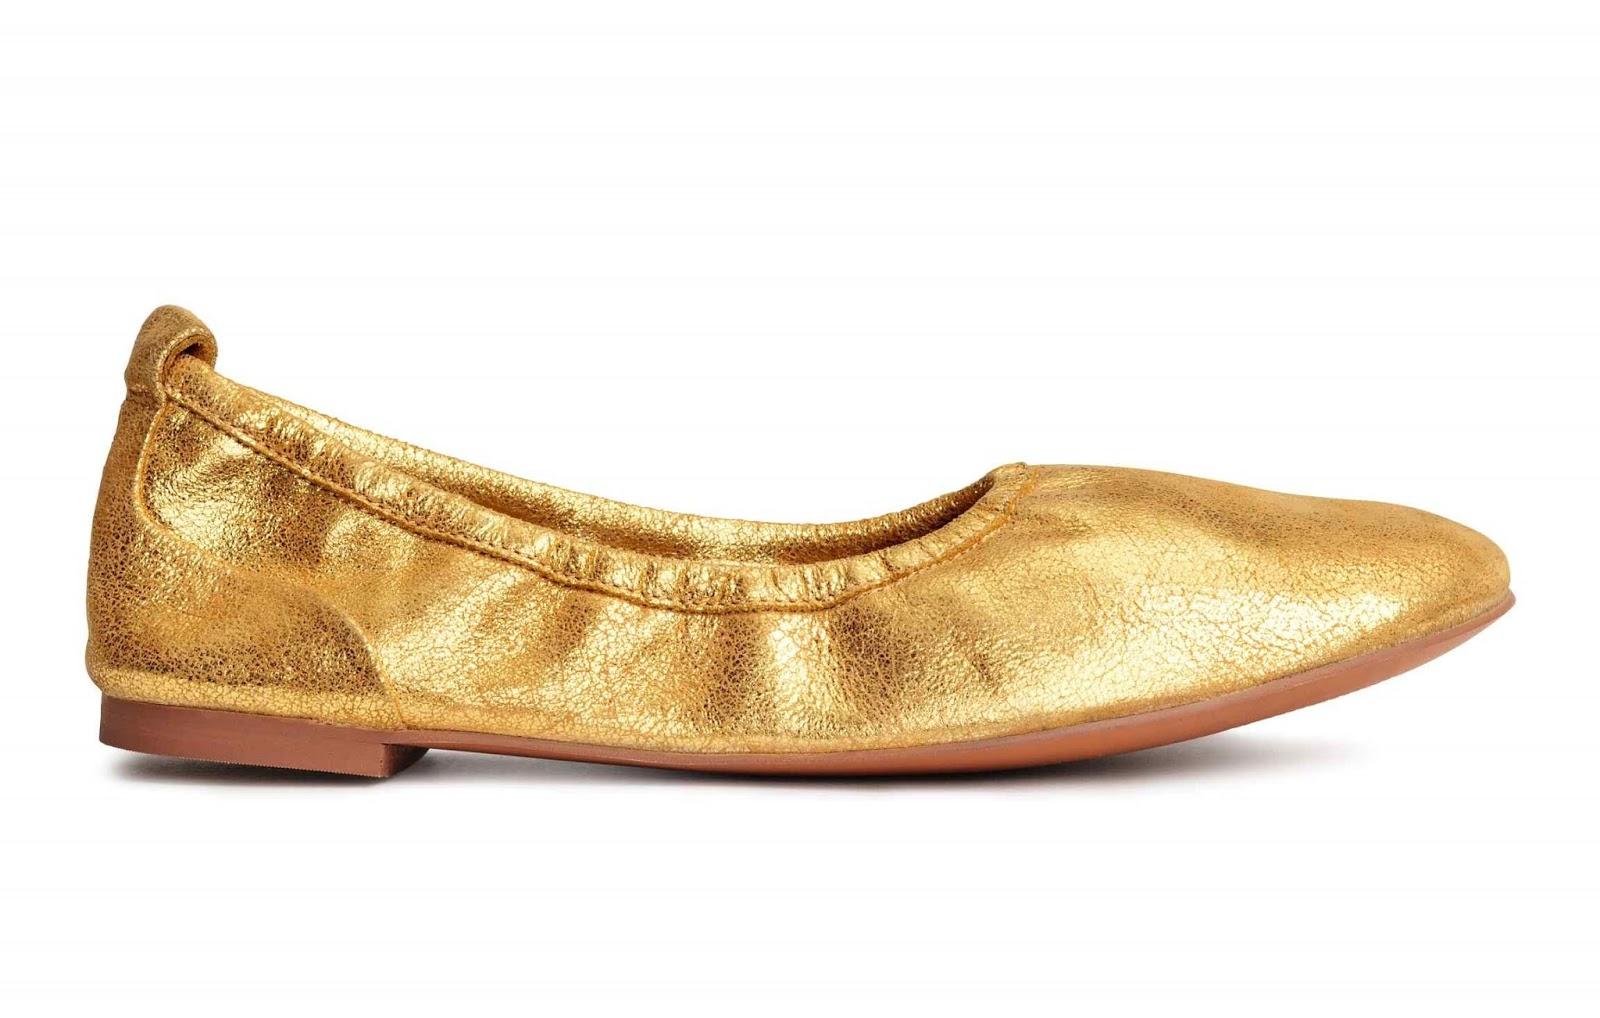 H&M złote balerinki Premium Quality